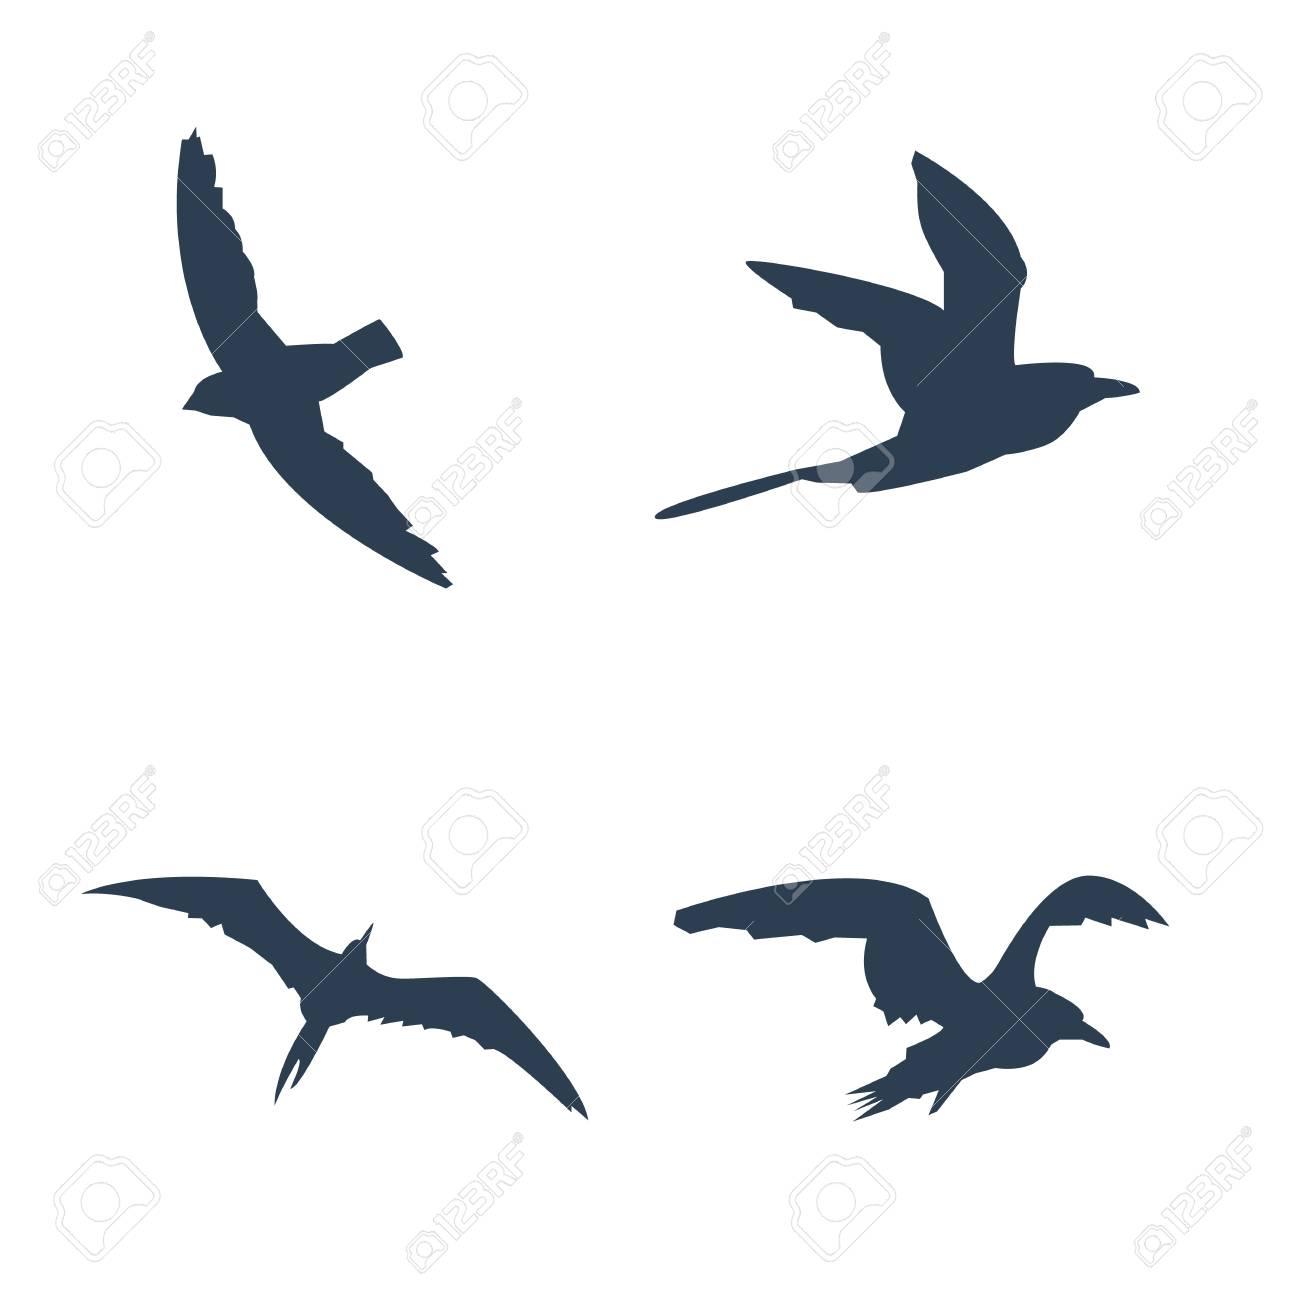 flying birds icons